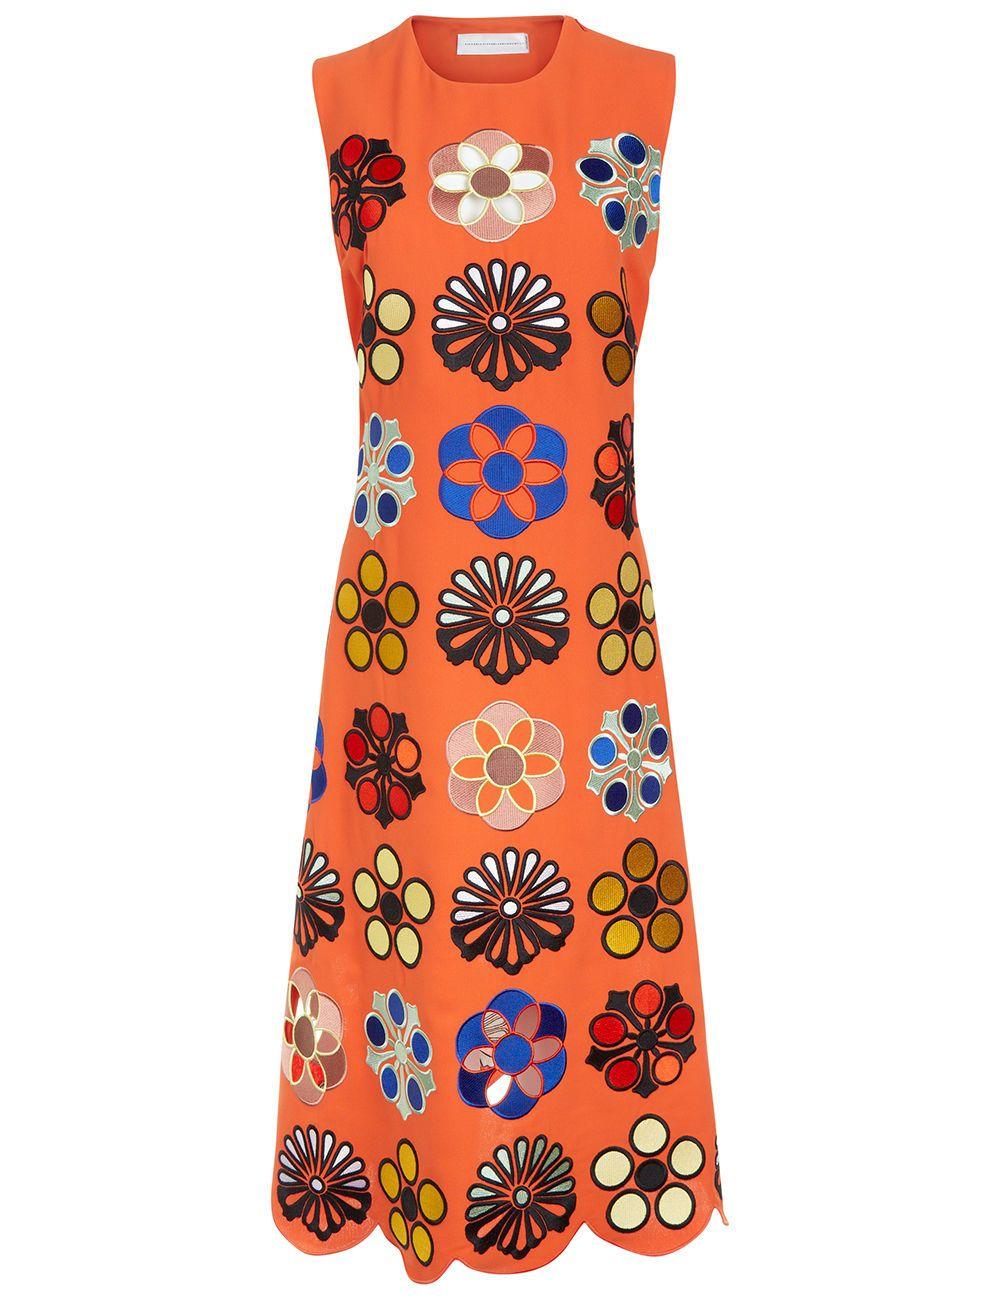 5a39a25ef VICTORIA VICTORIA BECKHAM Orange Crepe Embroidered Shift Dress.  #victoriavictoriabeckham #cloth #dress